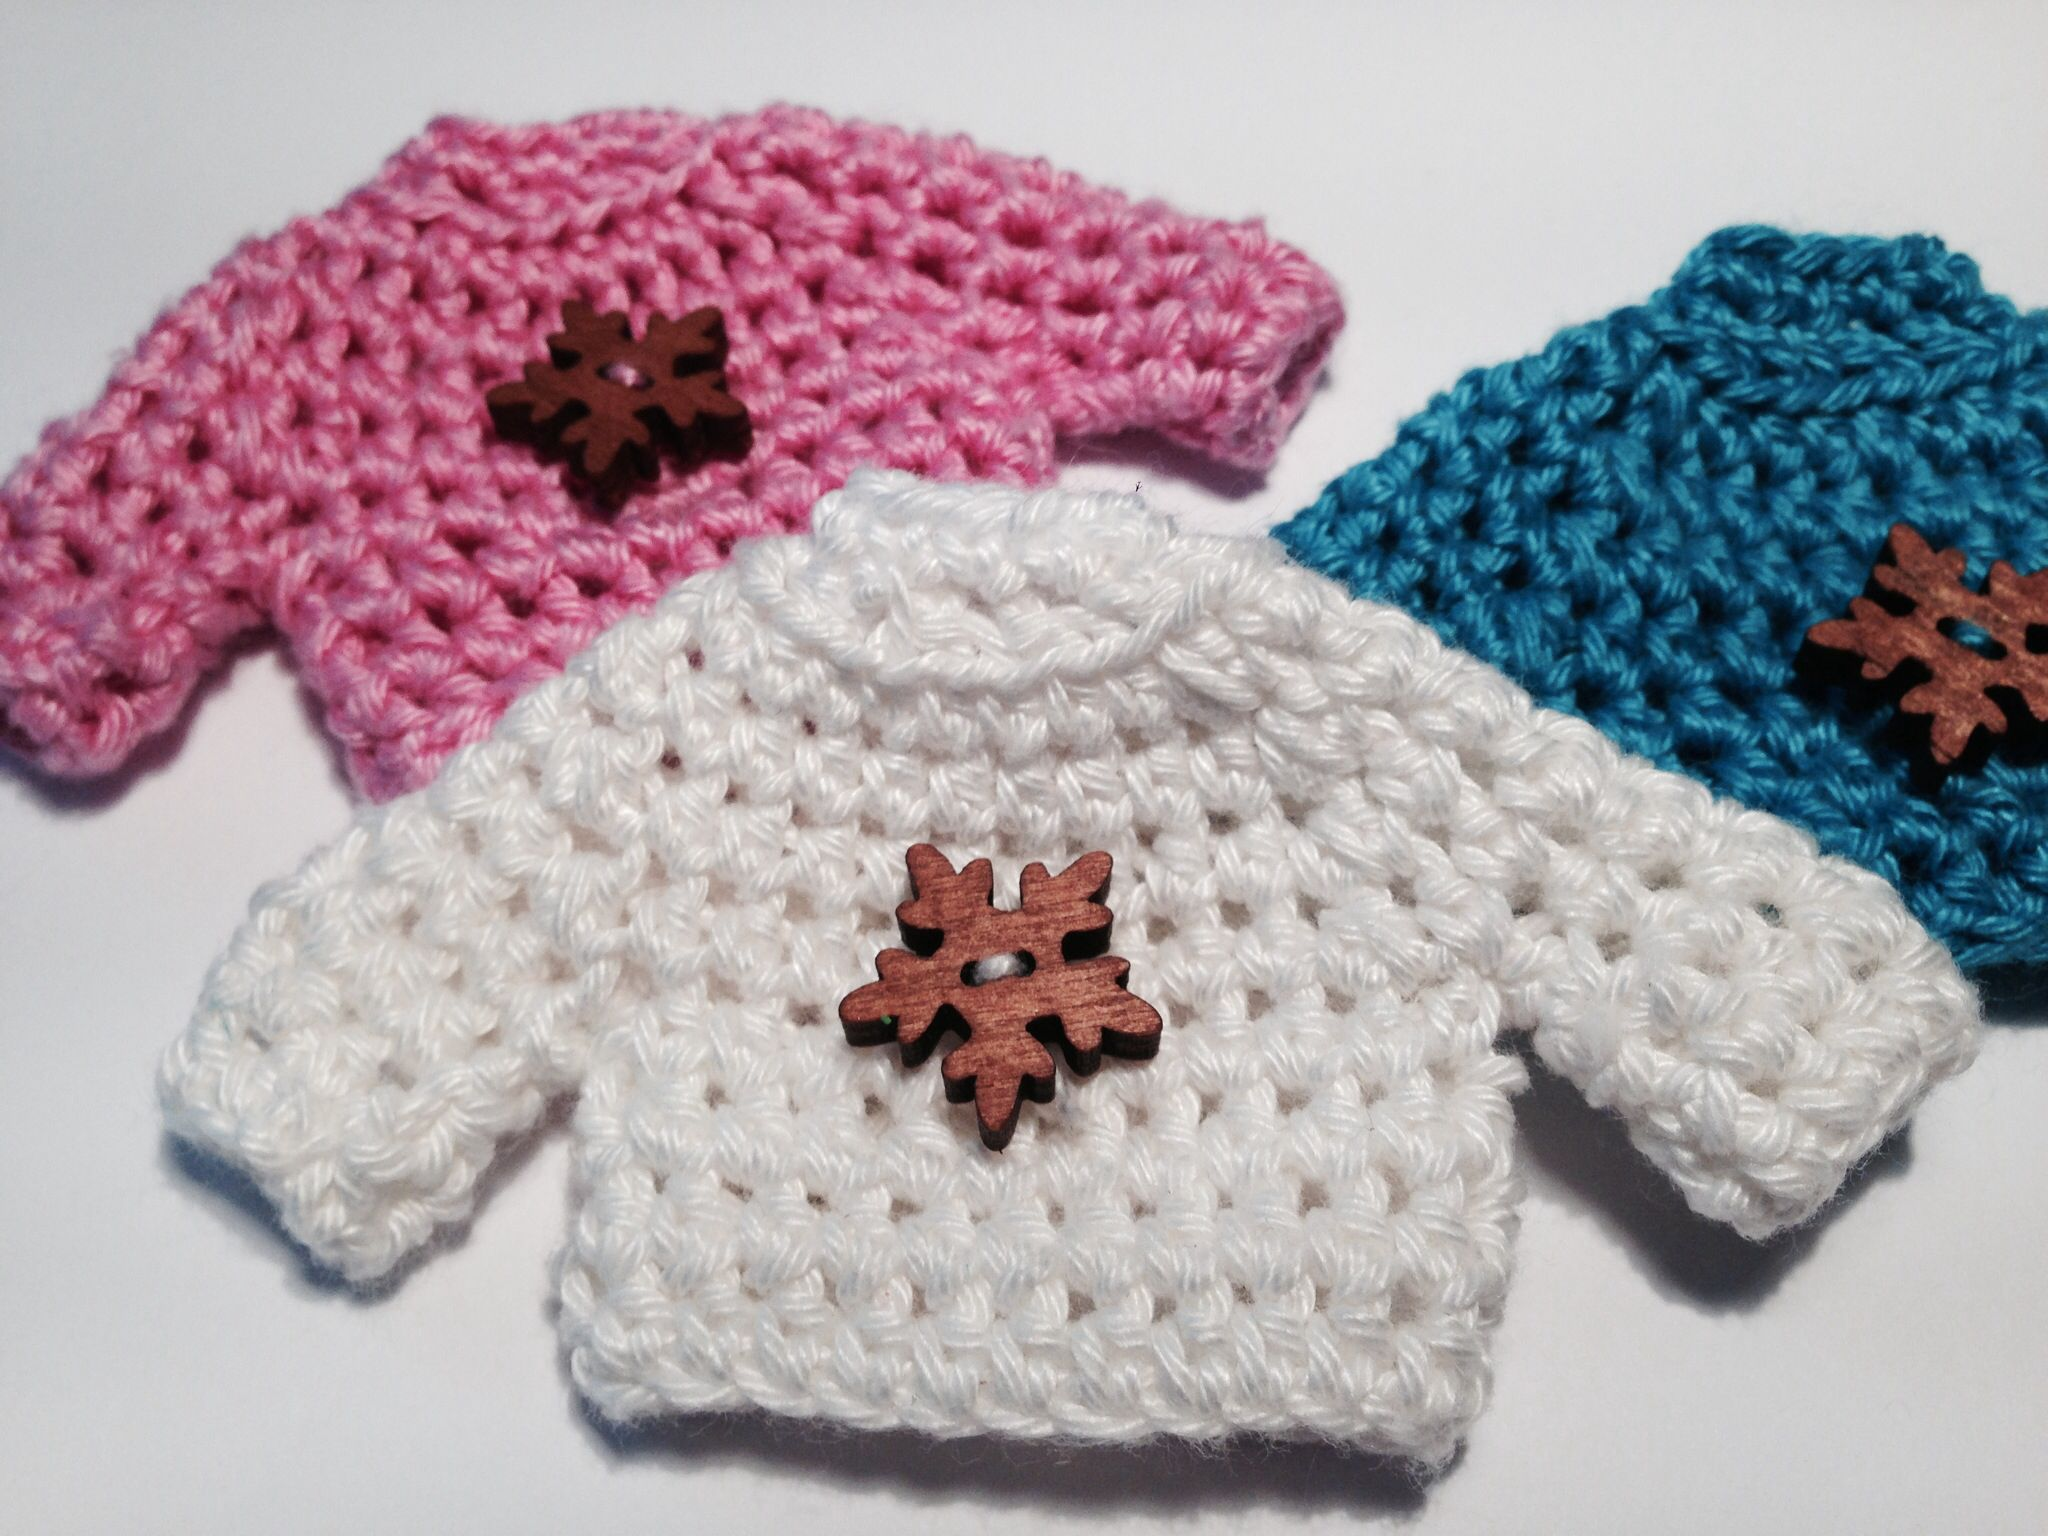 Crochet Keychain : Crochet keychain pullover keychain Pinterest